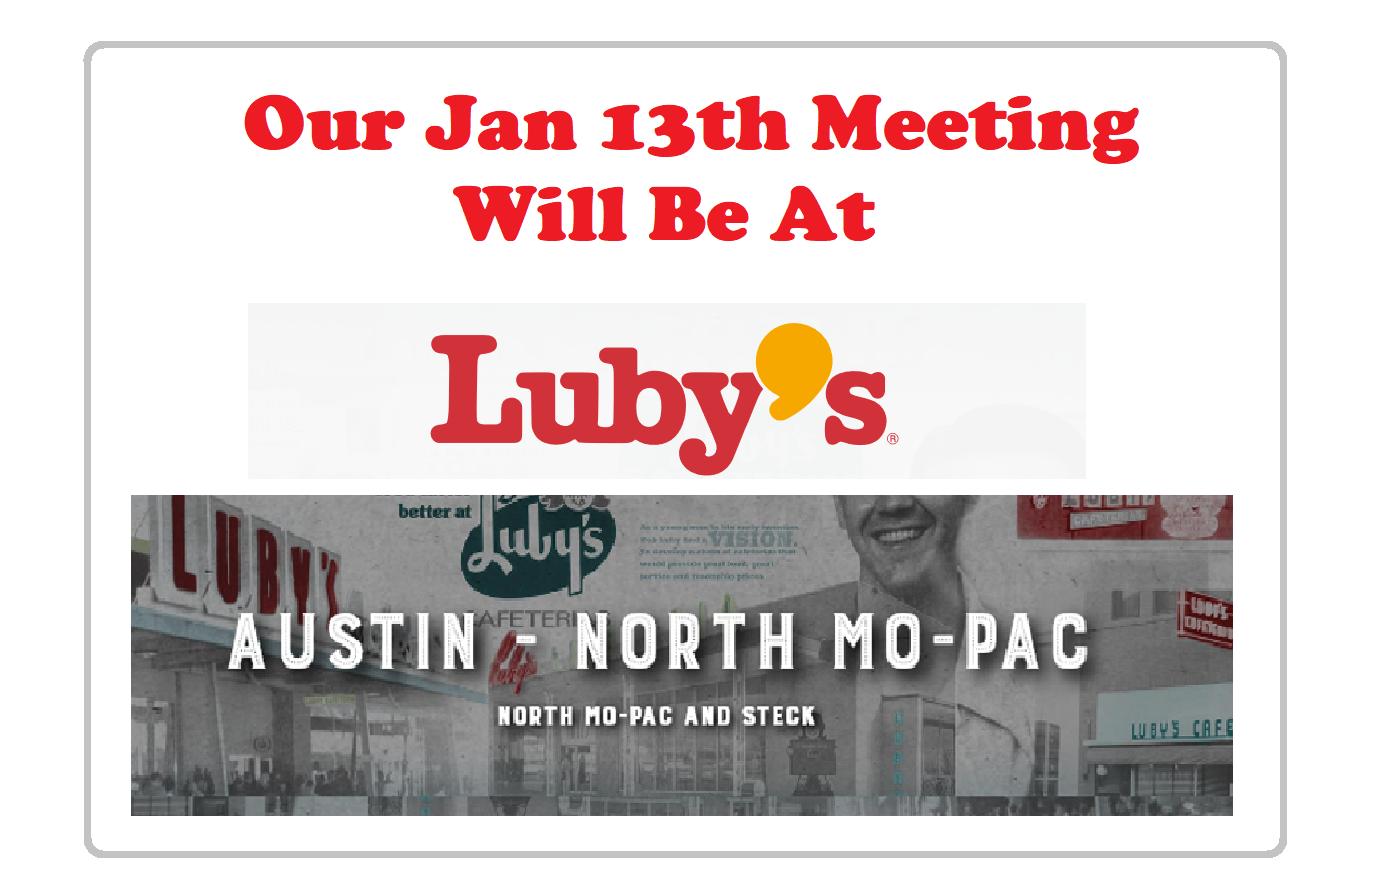 Next CRW Club Meeting is Jan 13th